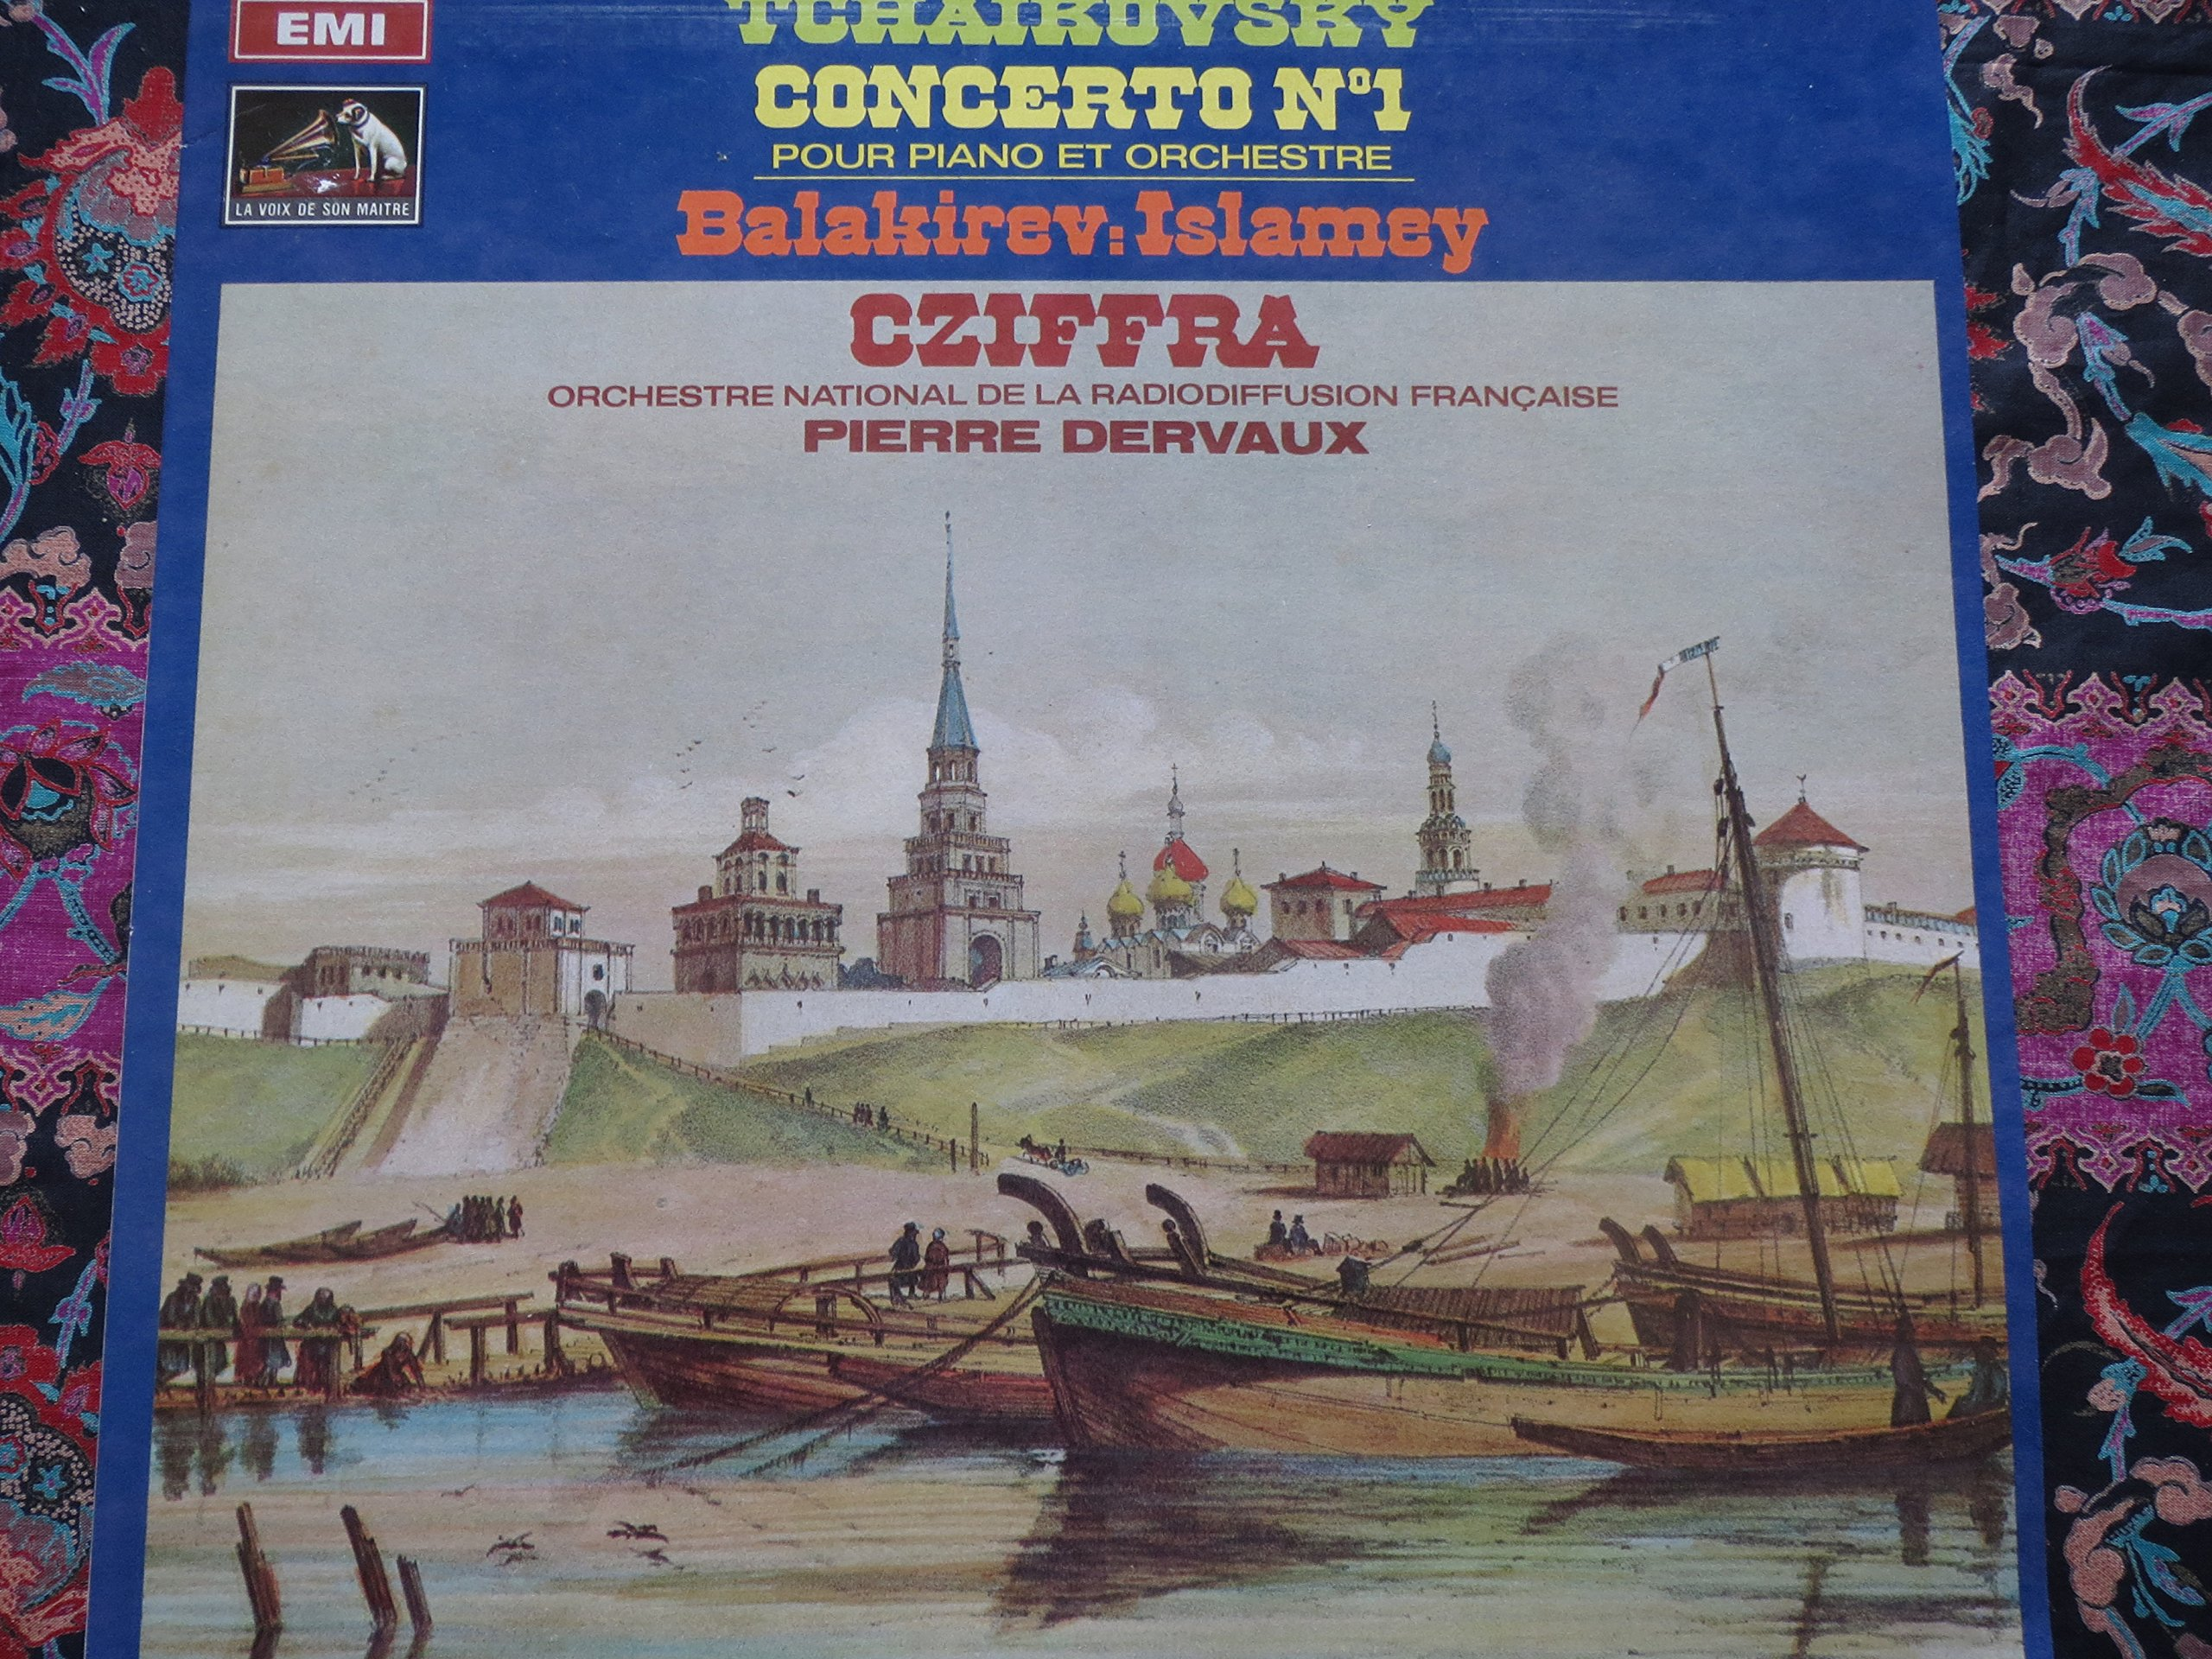 Gyorgy Cziffra: Tchaikovsky Piano Concerto No. 1 / Balakirev Islamey (Oriental Fantasy) / Orchestre National De La Radiodiffusion Francaise, Conductor Pierre Dervaux